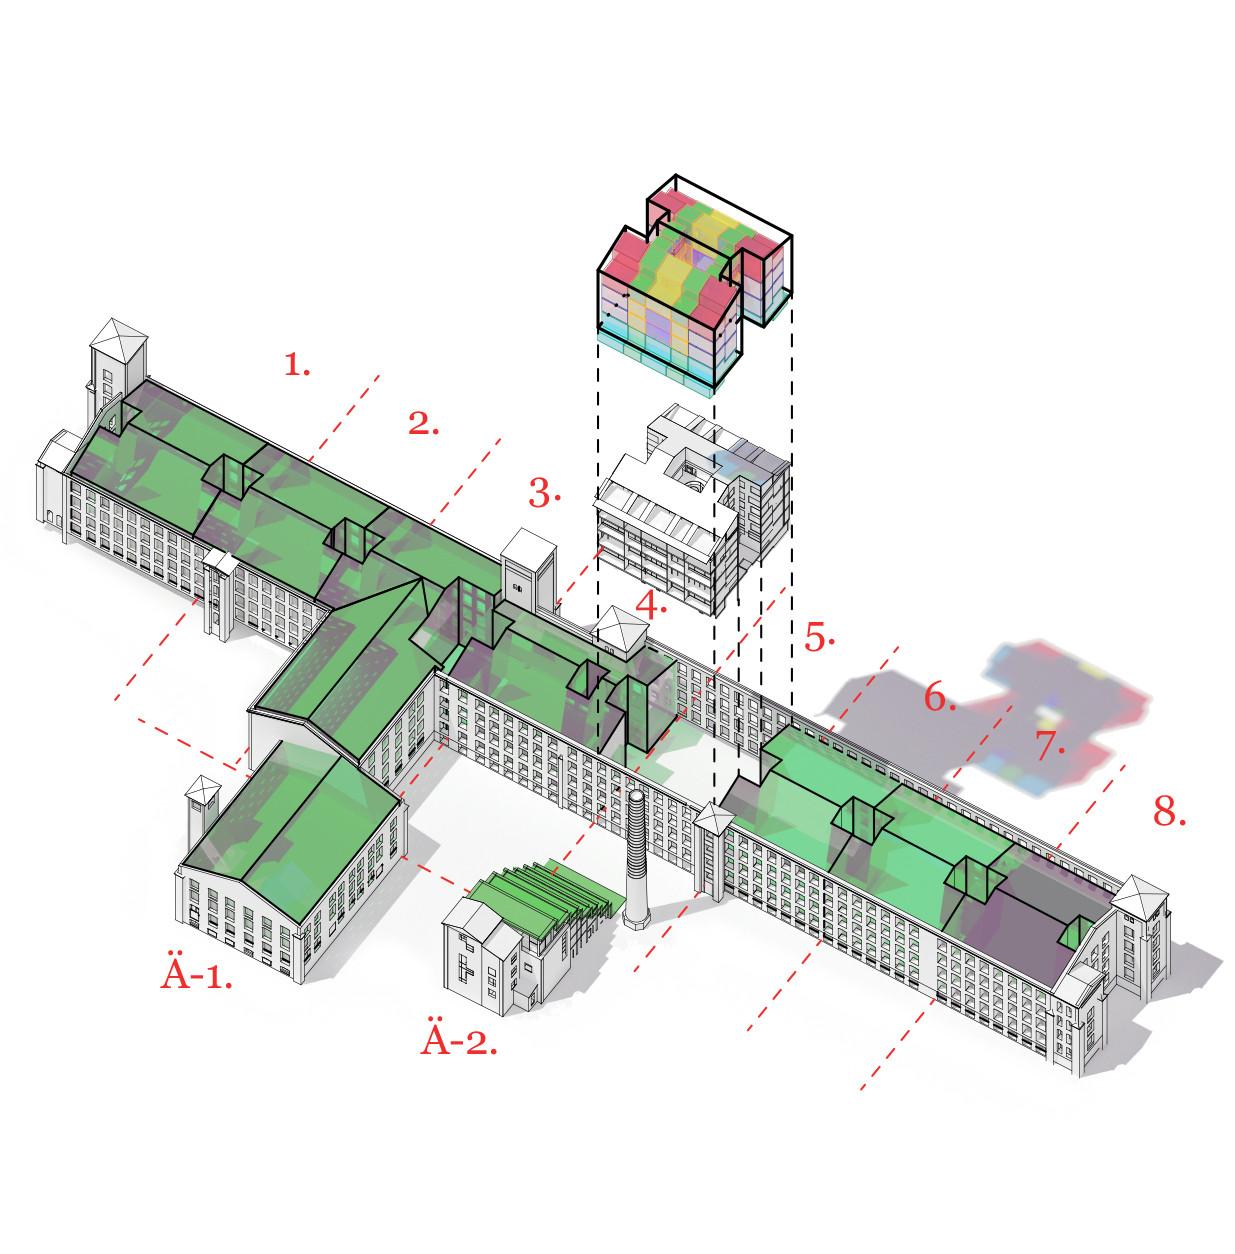 diagramm_axo1.jpg